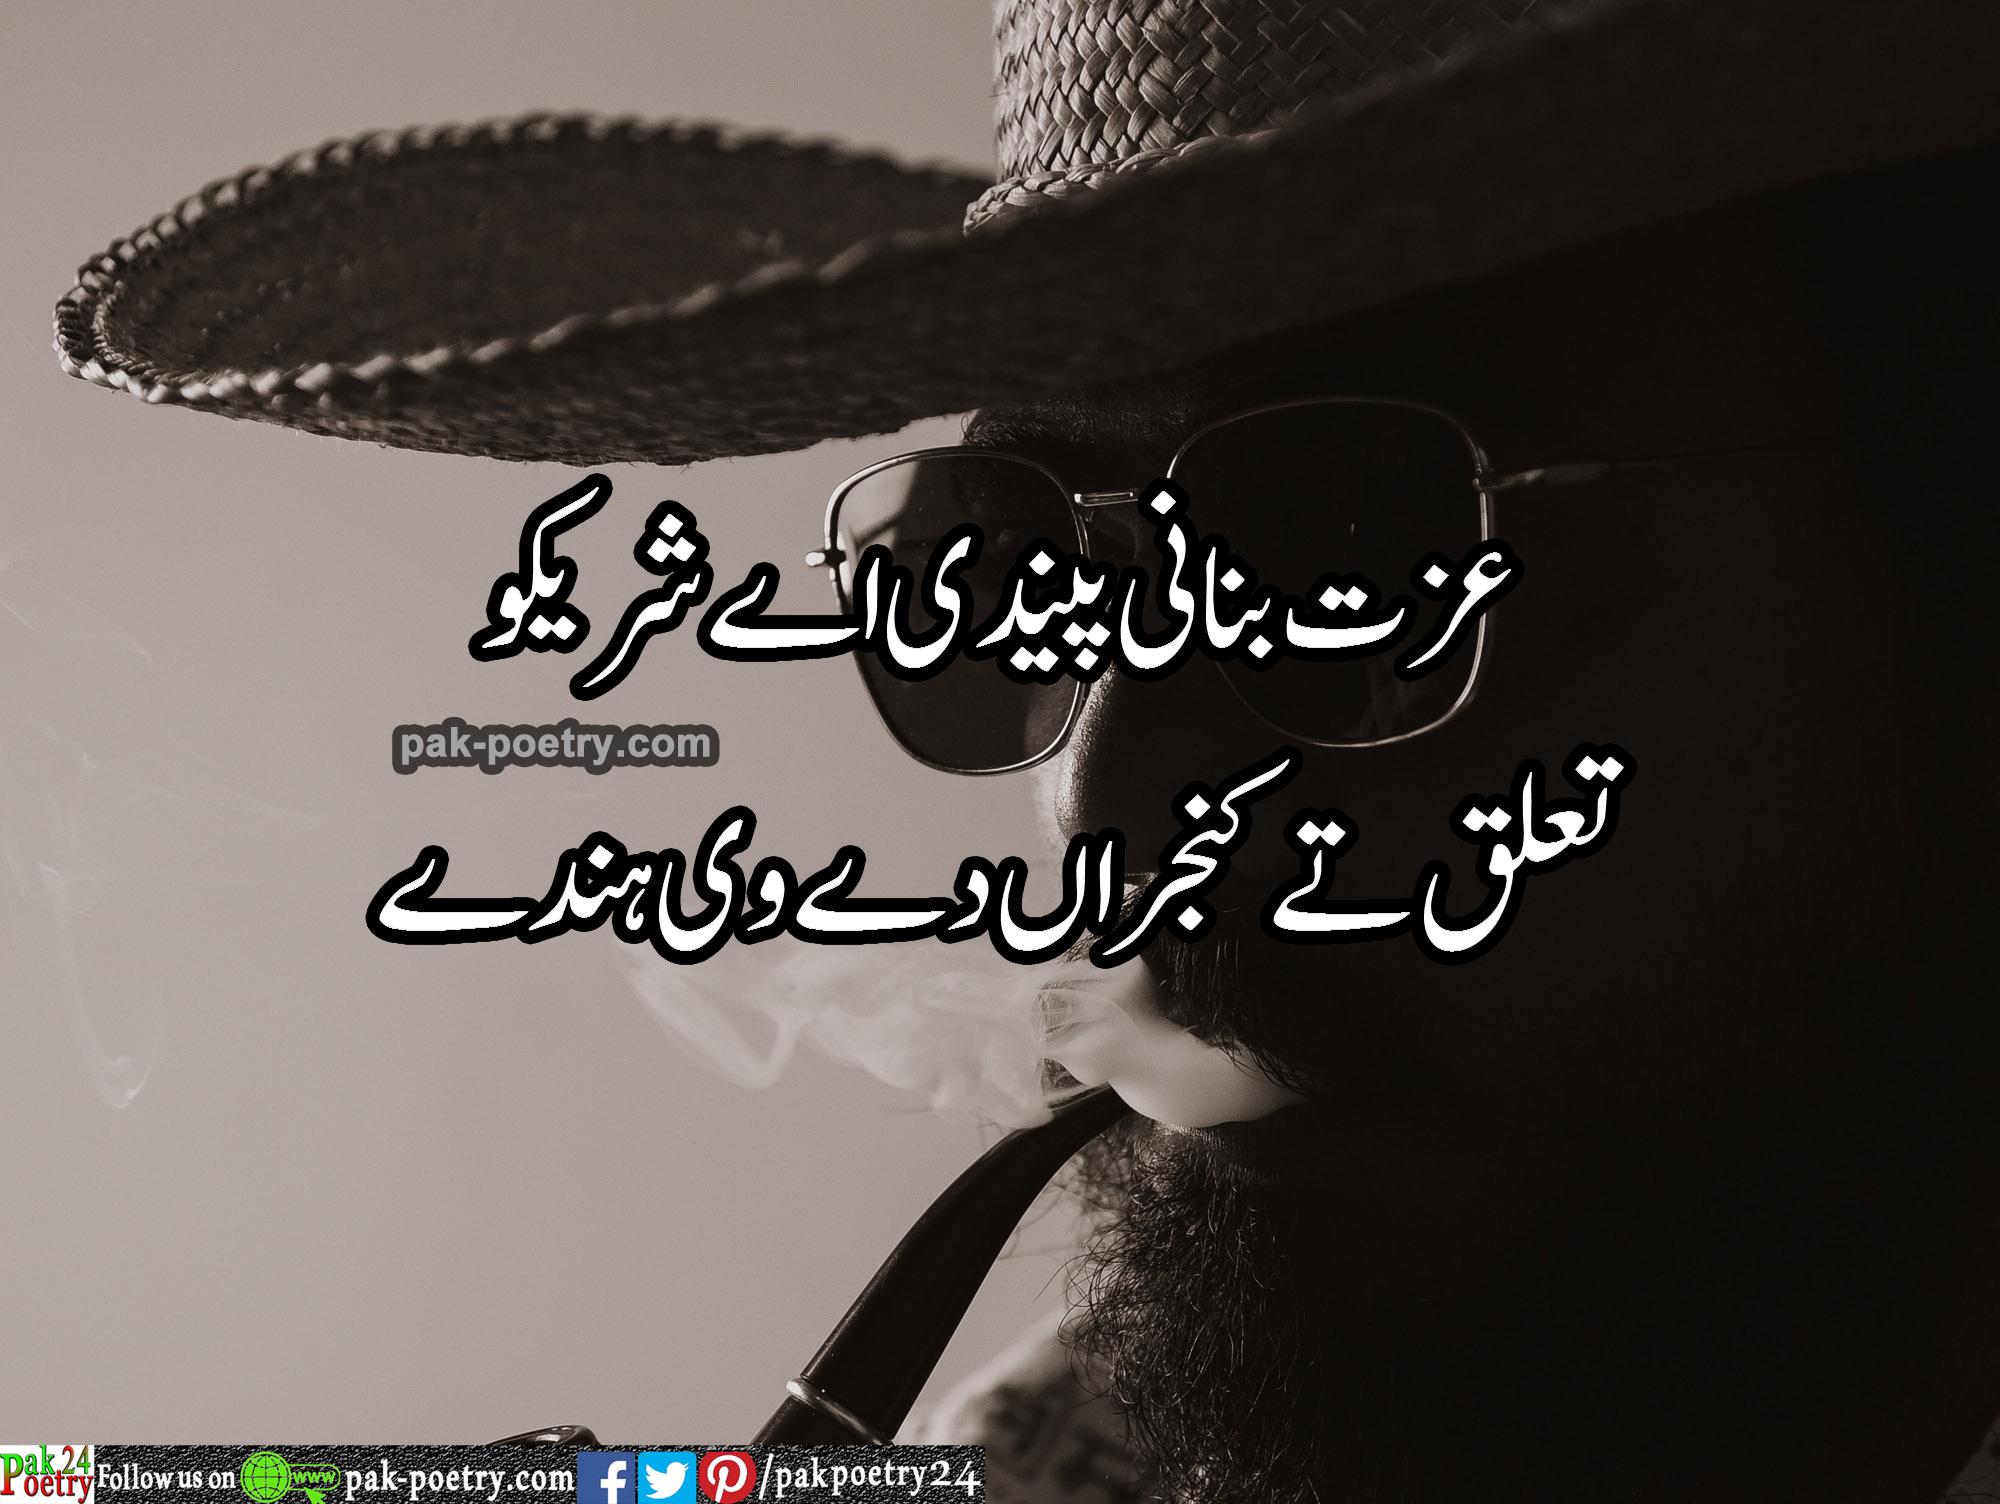 Attitude poetry, attitude poetry in urdu, attitude urdu poetry, attitude poetry urdu, attitude poetry images, poetry attitude, urdu attitude poetry, joker attitude, joker attitude images, punjabi poetry, poetry punjabi, poetry in punjabi, punjabi poetry pics,